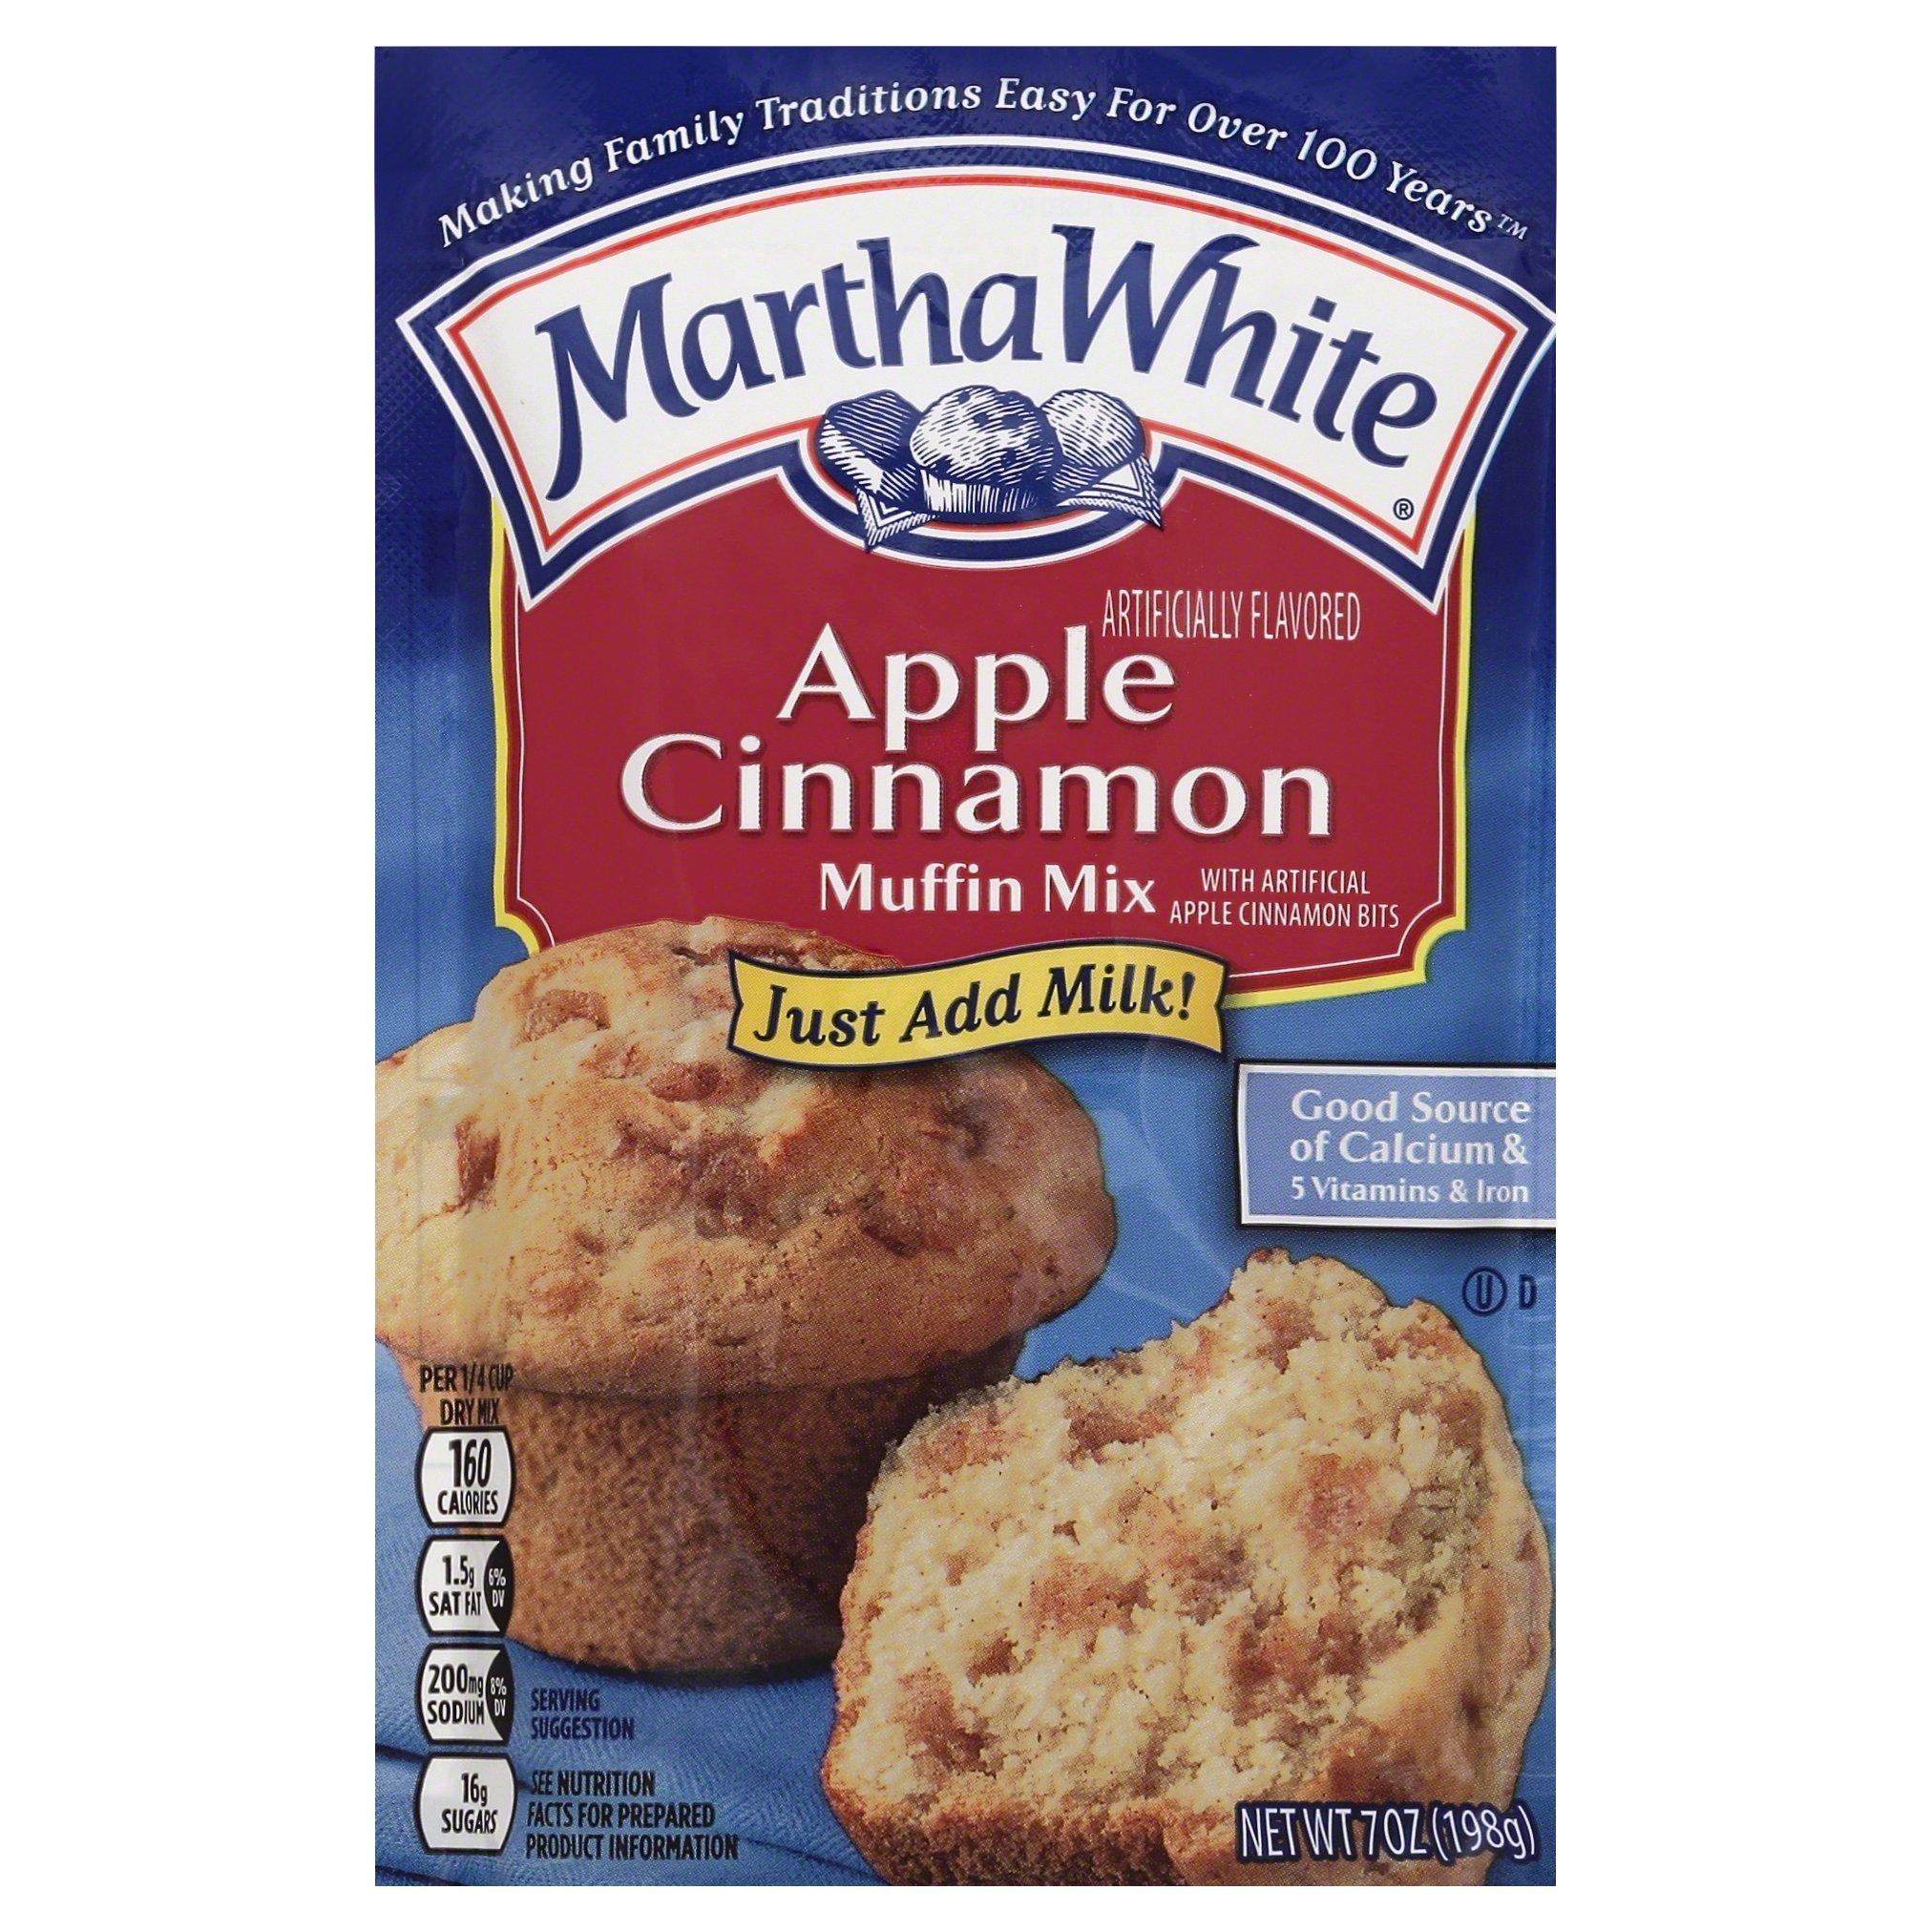 Martha White Apple Cinnamon Muffin Mix, 7 oz